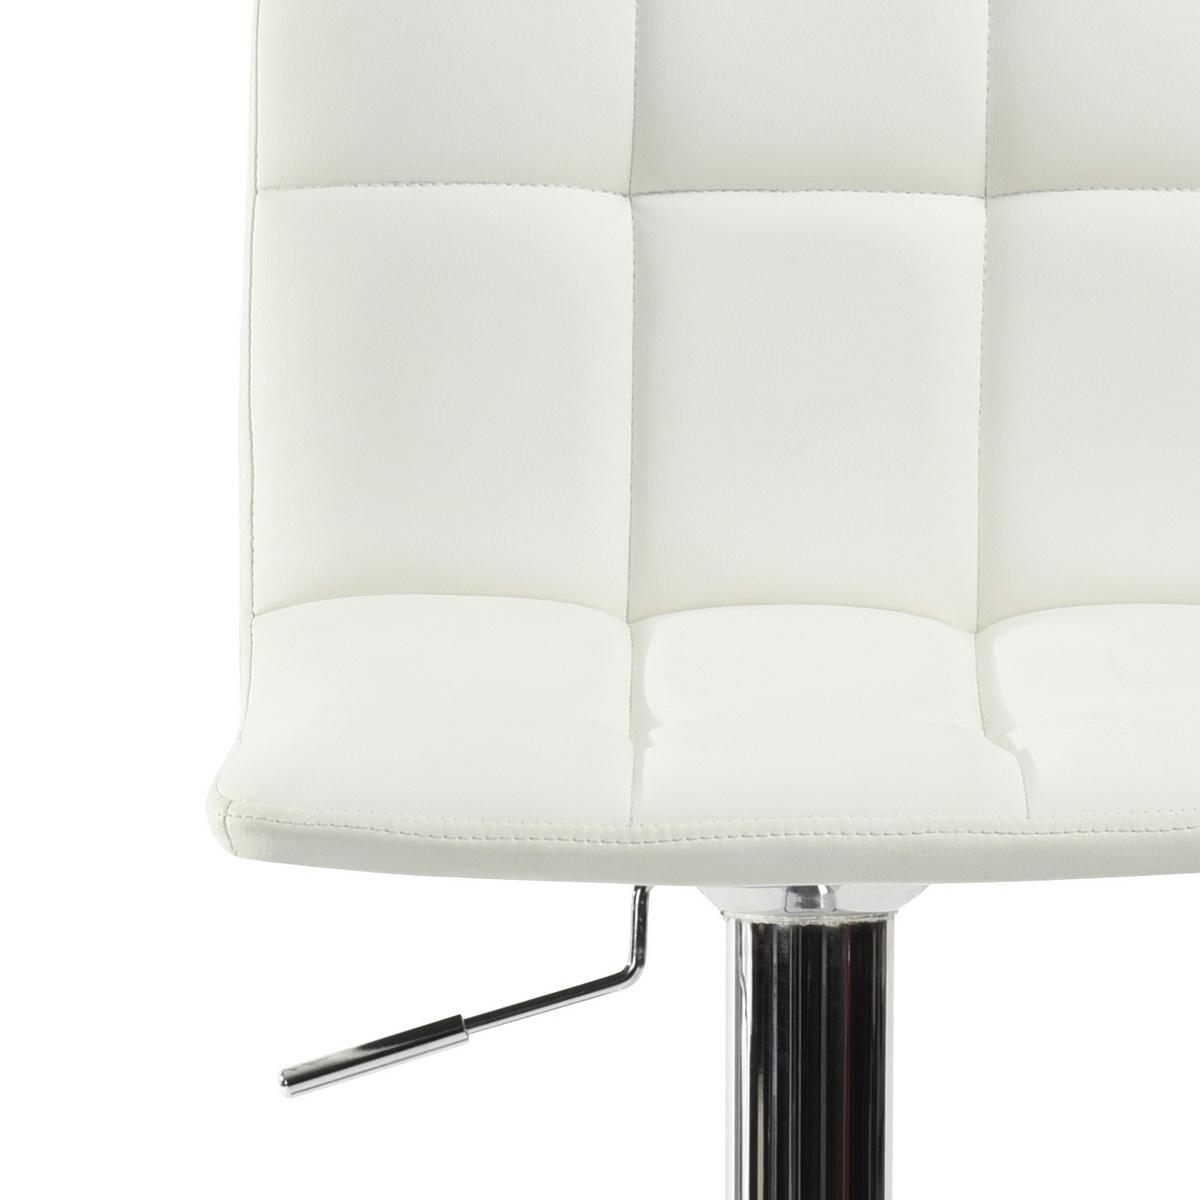 tabouret de bar contemporain simi noir m tal chrom repose. Black Bedroom Furniture Sets. Home Design Ideas